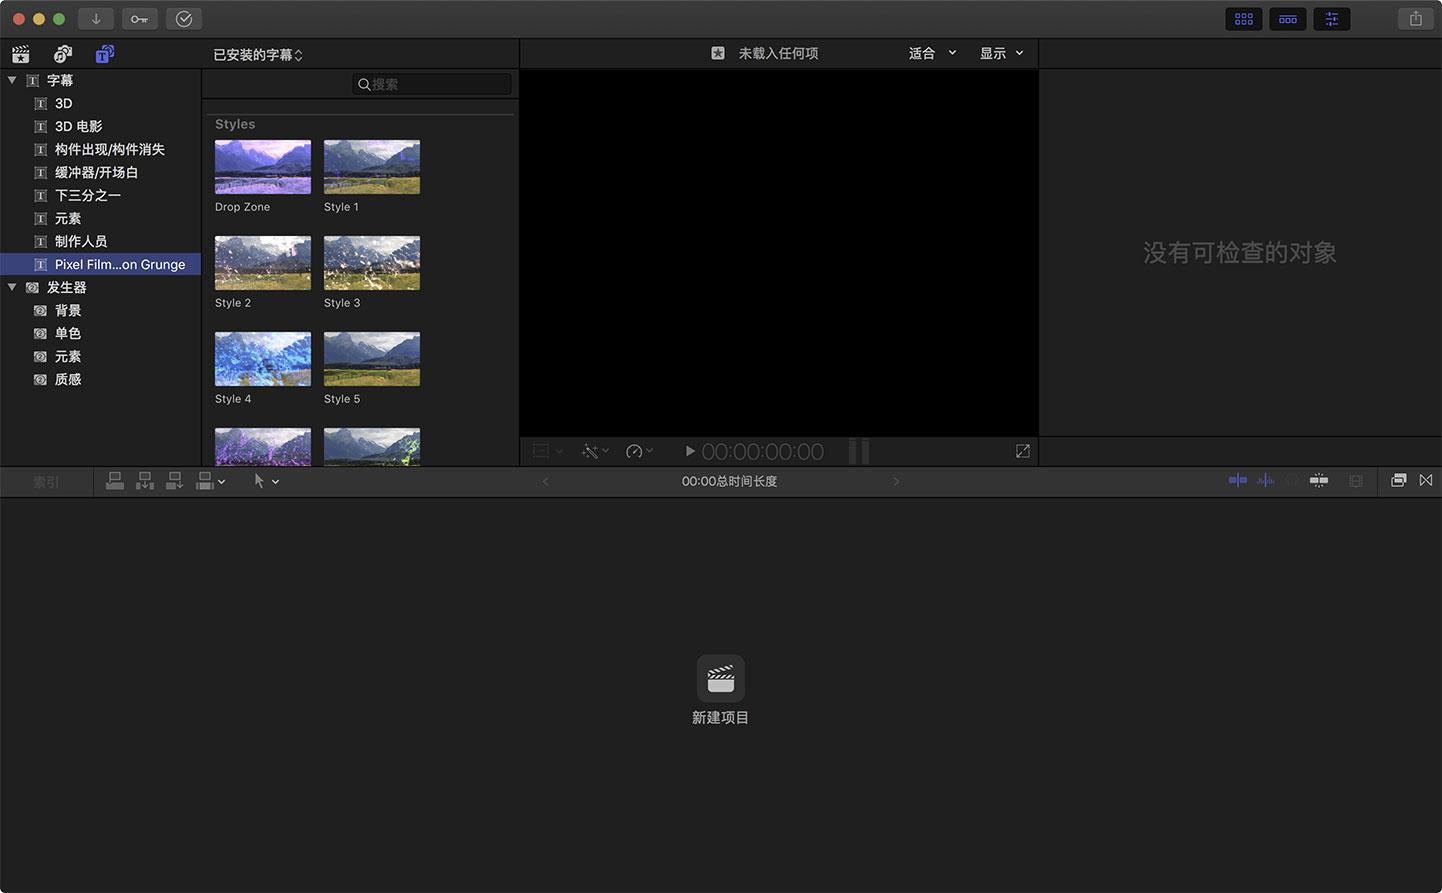 Final Cut Pro X 10.4 – 专业高效高性能的Mac视频剪辑编辑解决方案软件